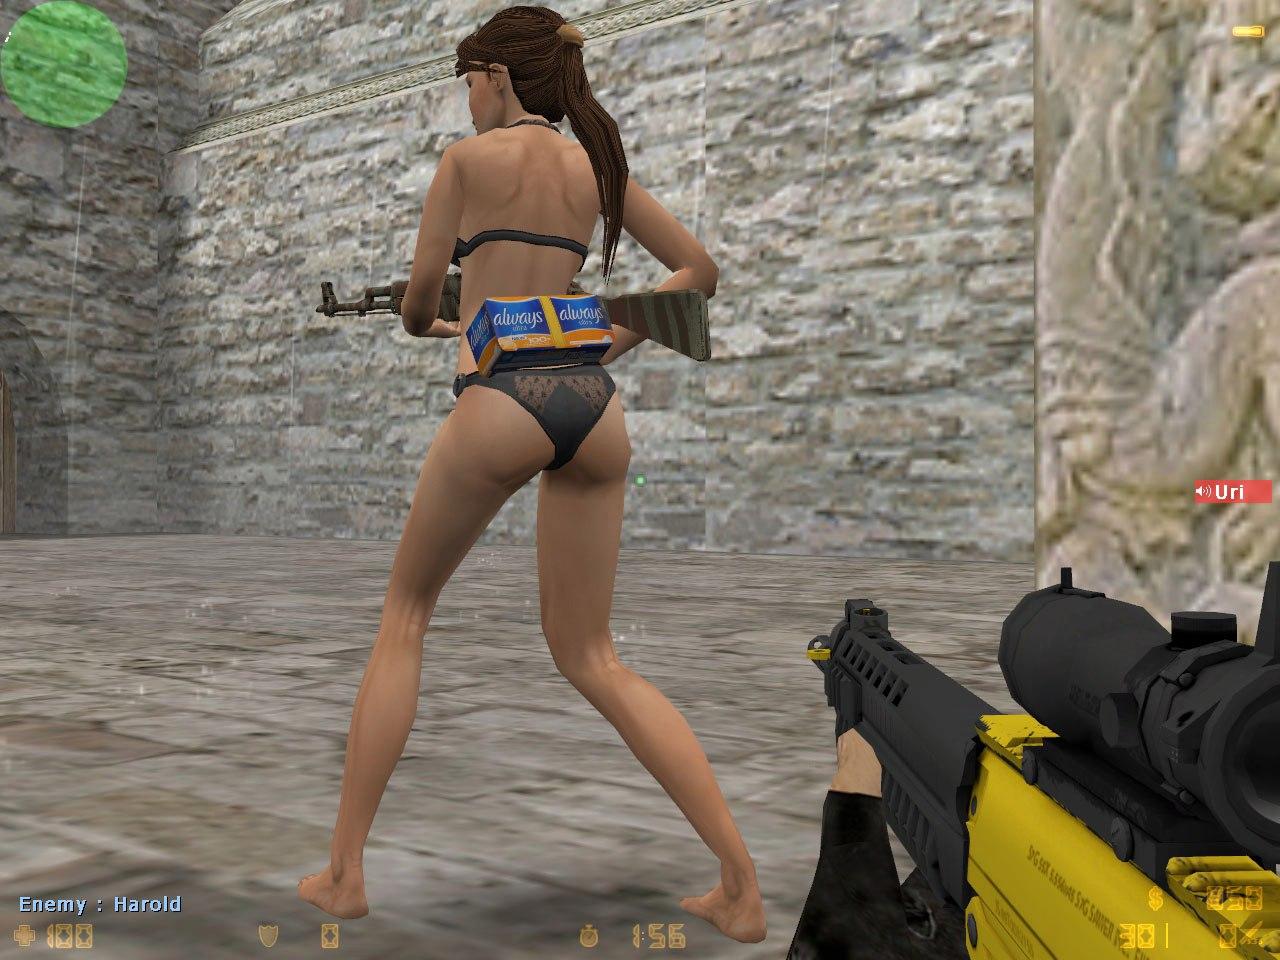 Lara croft bikini sex pictures